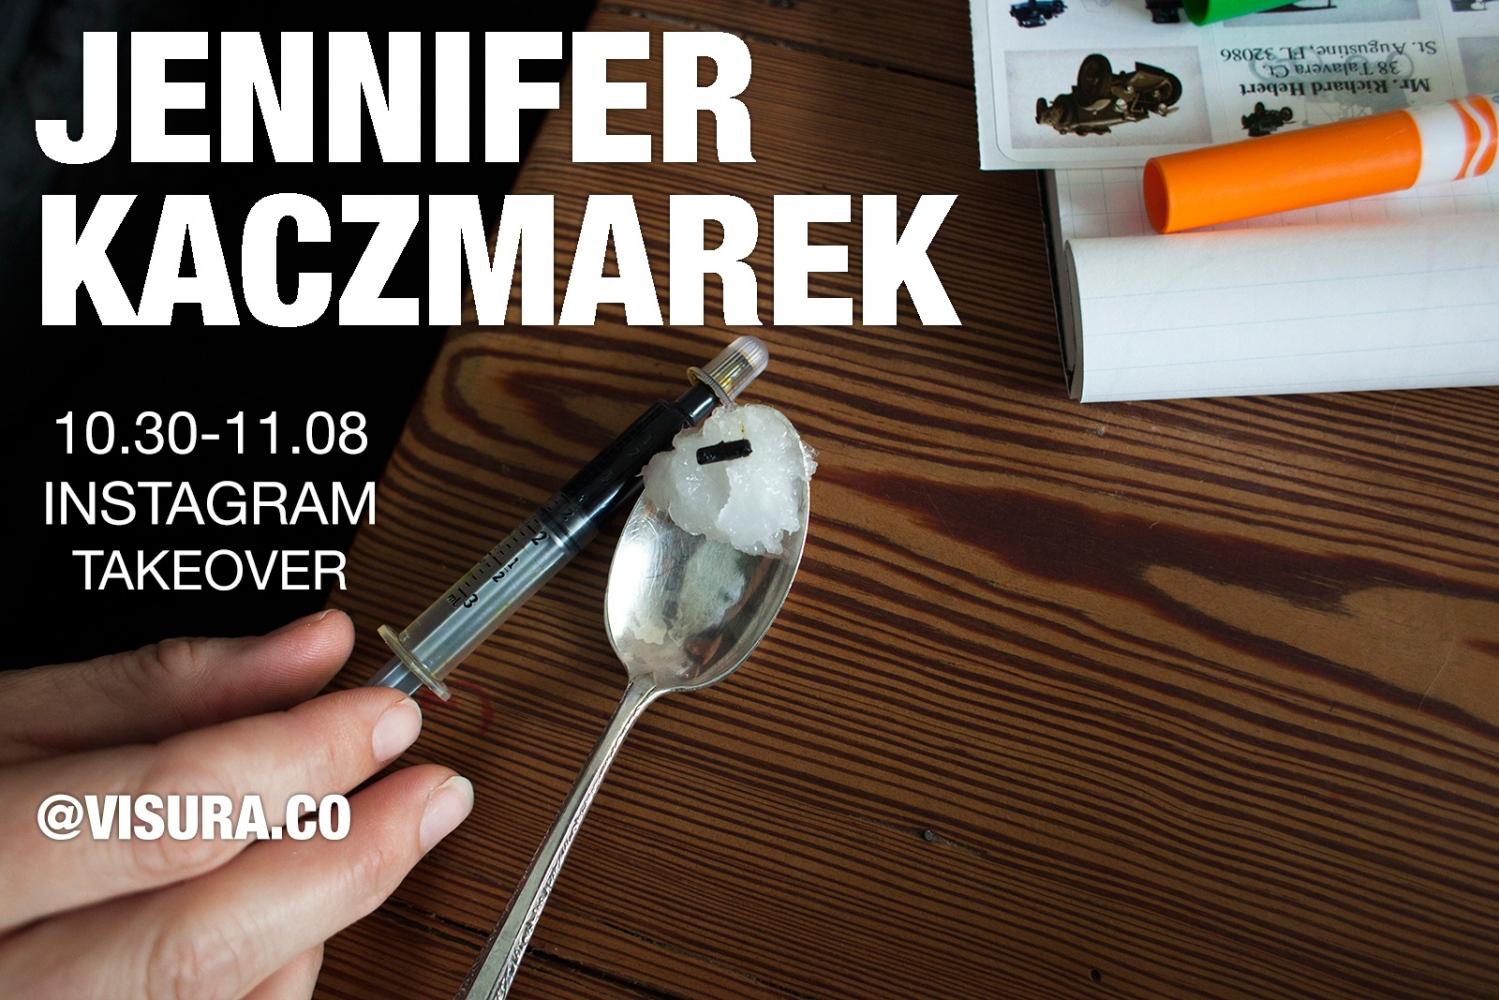 Art and Documentary Photography - Loading IMG_6598_visura_jennifer_kaczmarek_(1).jpg